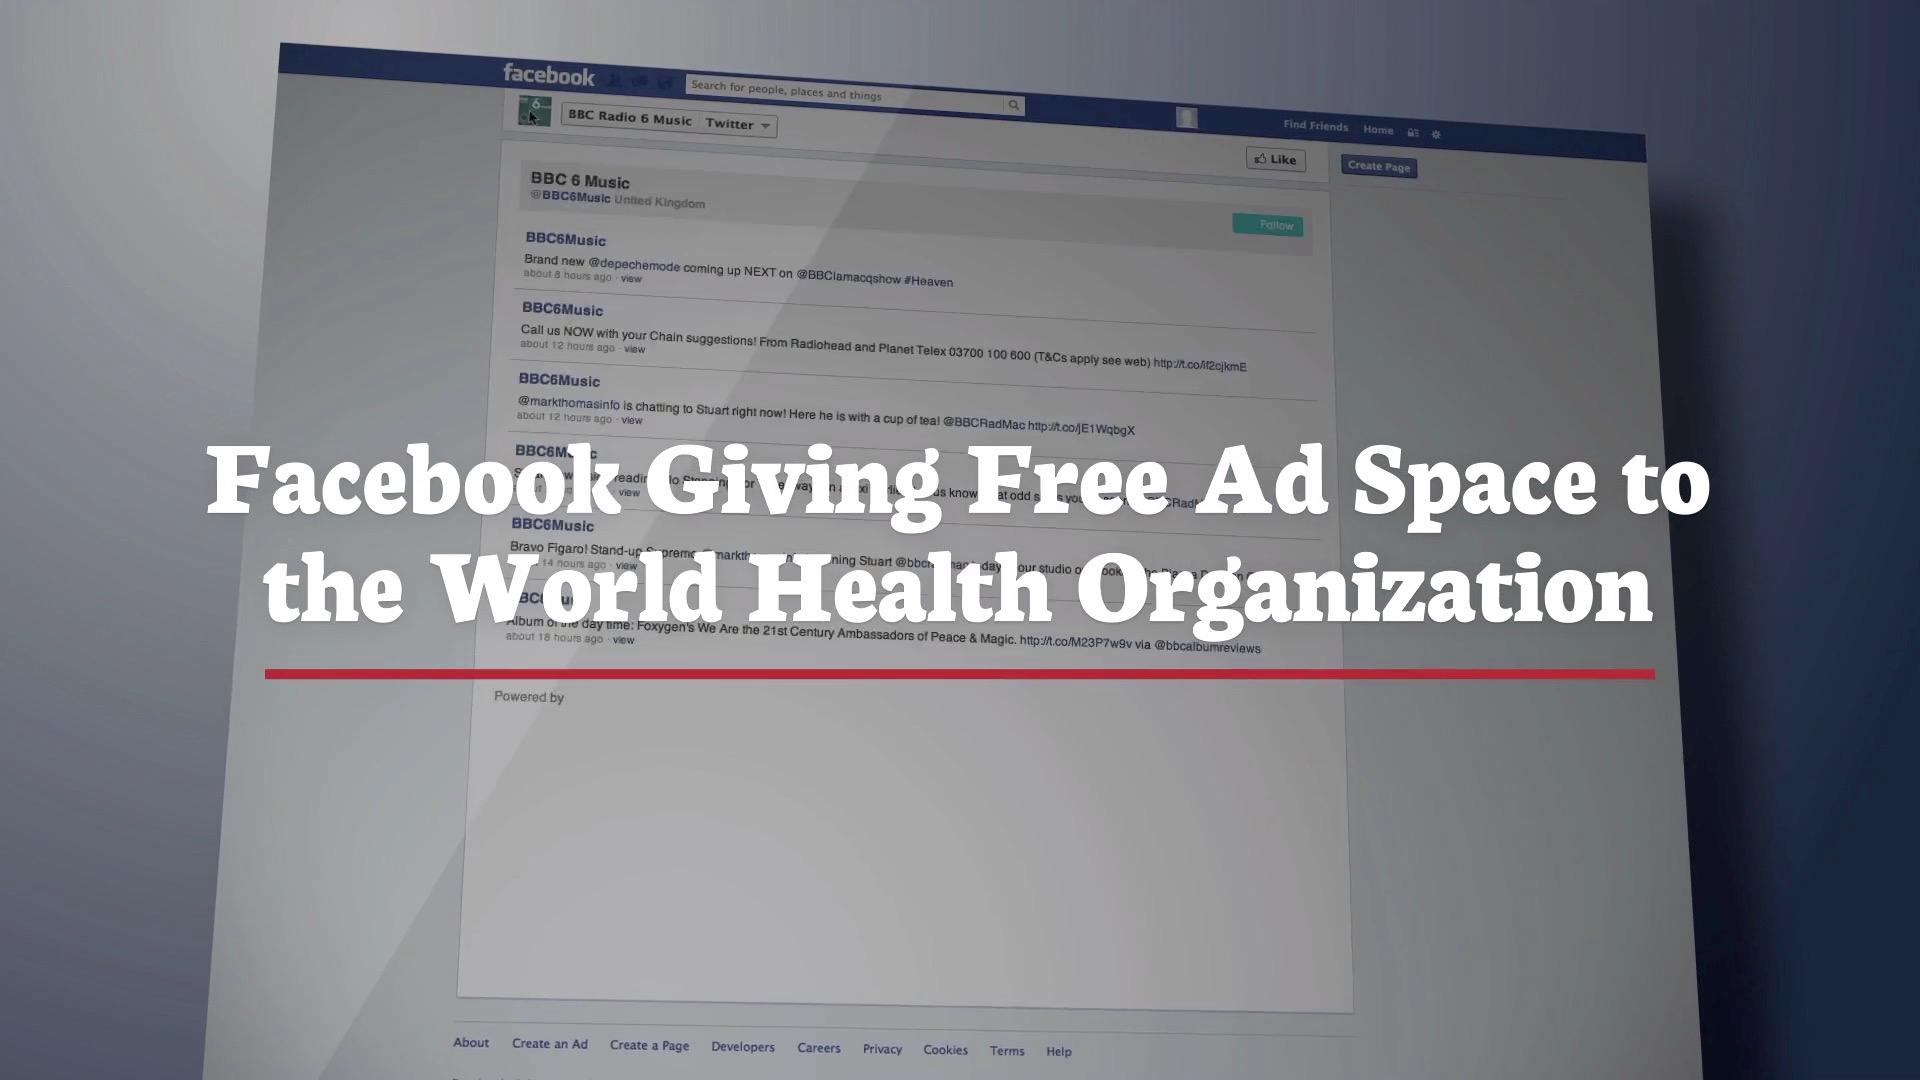 Facebook Supports The World Health Organization